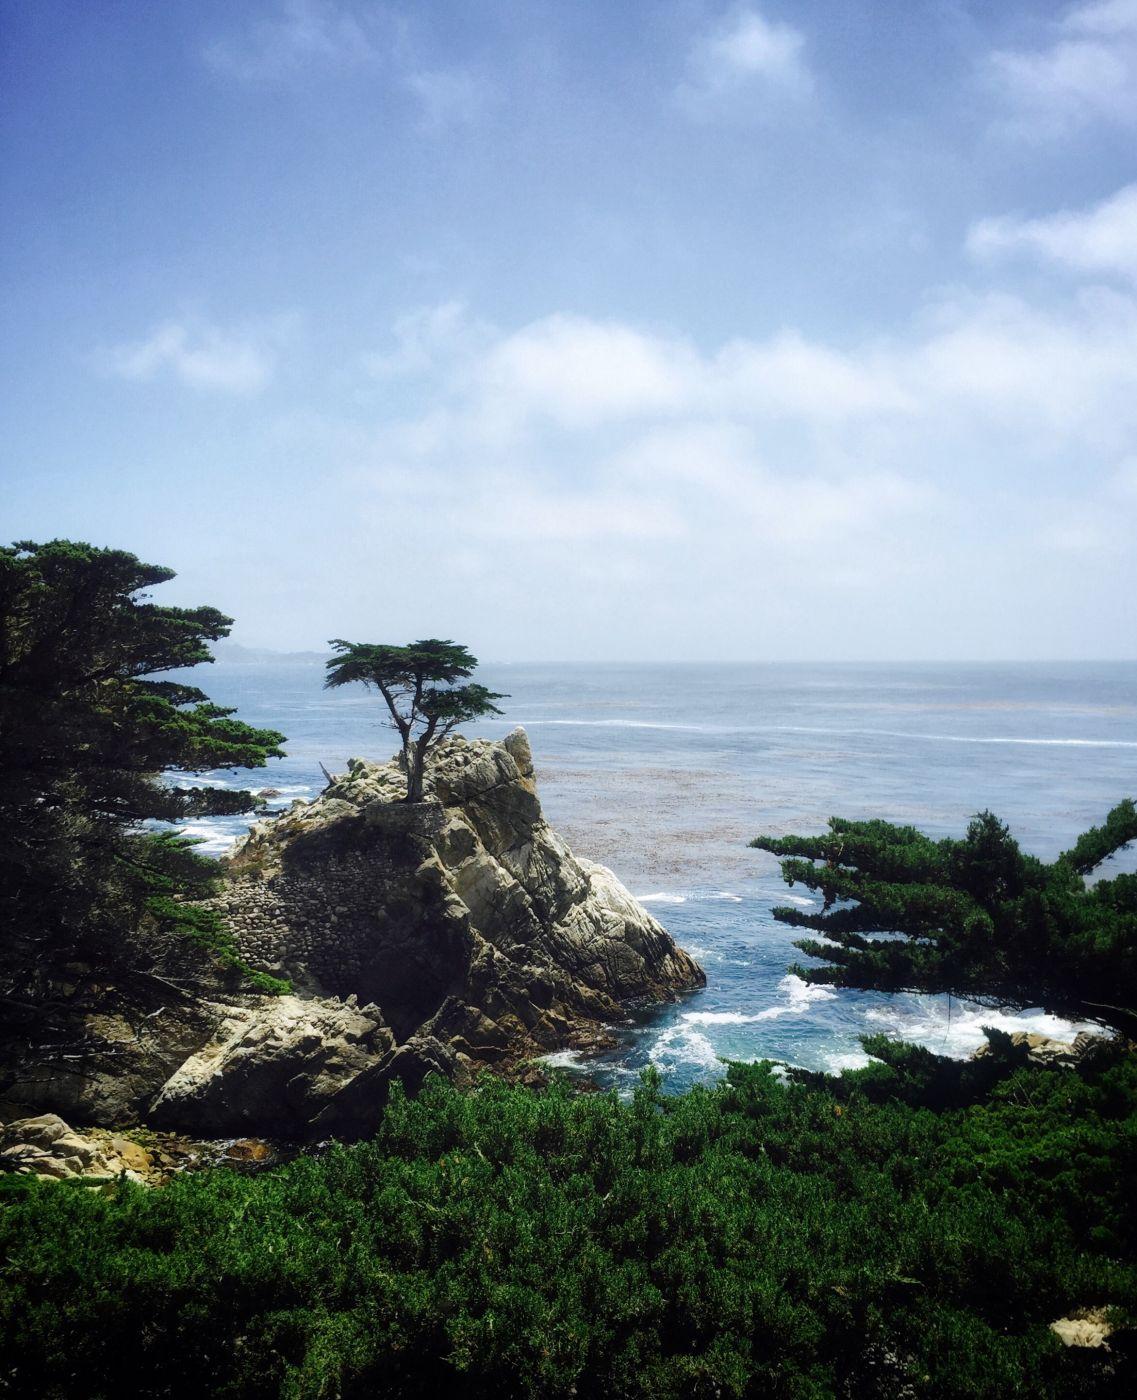 The Lone Cypress, USA